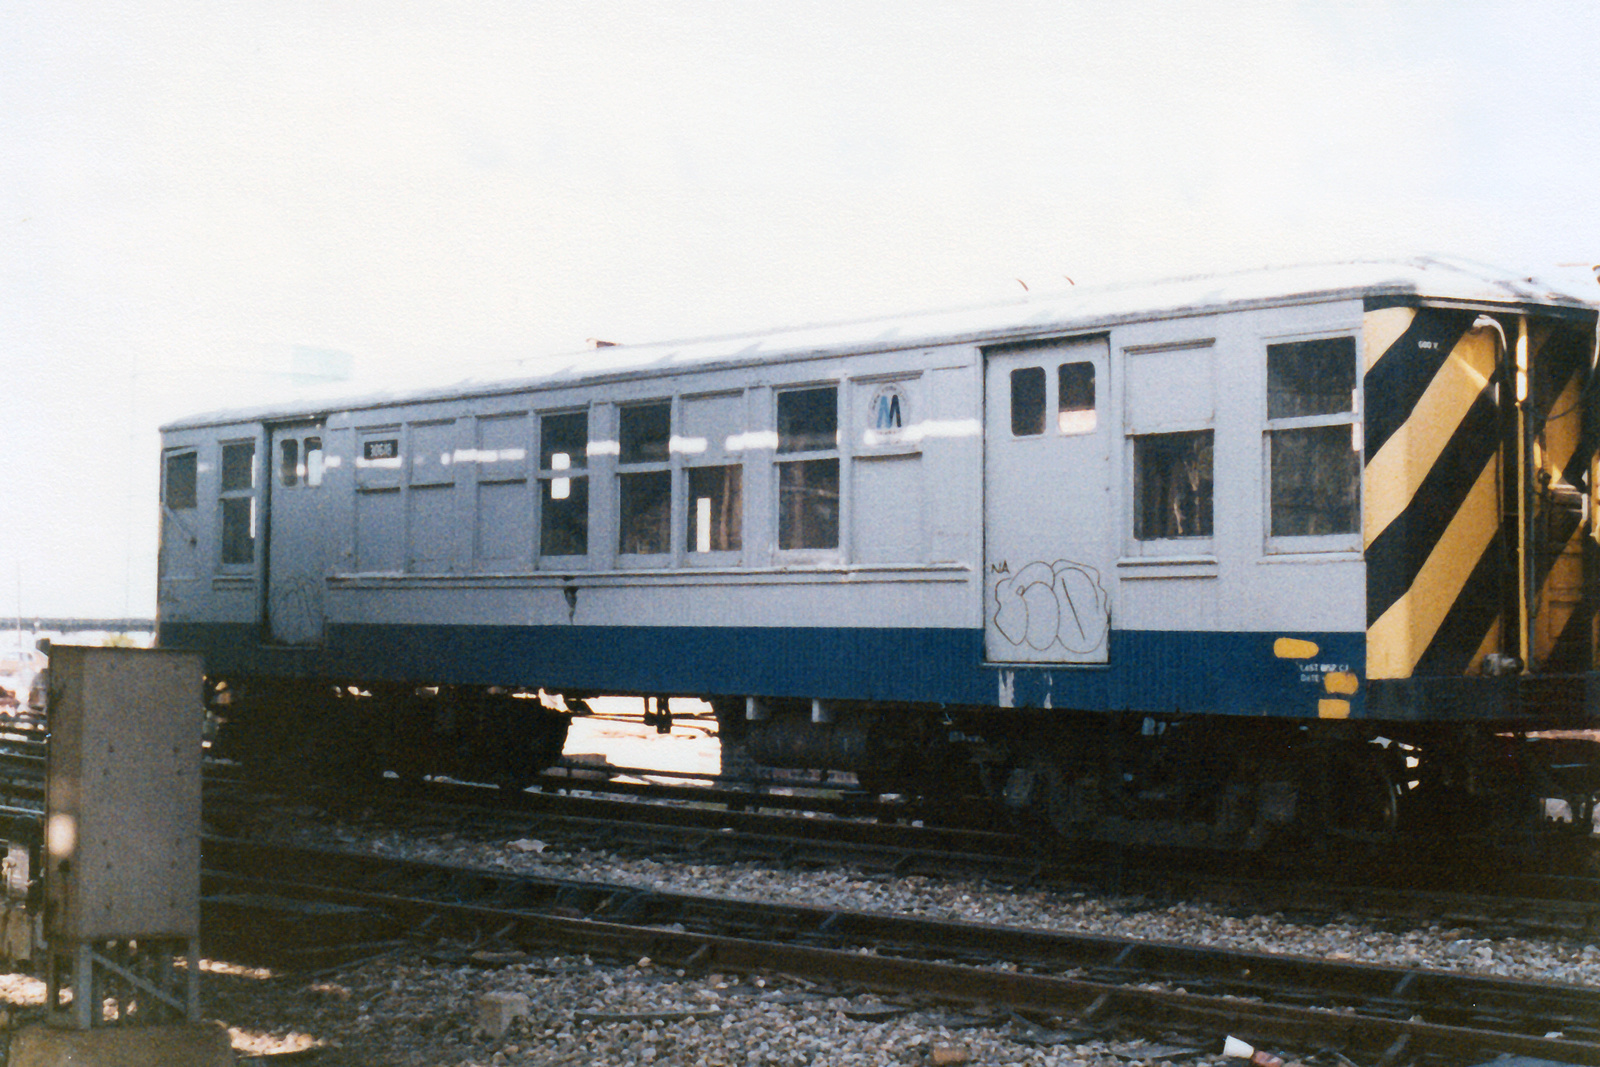 (775k, 1600x1067)<br><b>Country:</b> United States<br><b>City:</b> New York<br><b>System:</b> New York City Transit<br><b>Location:</b> Coney Island Yard<br><b>Car:</b> BMT Q 30618 (ex-1631)<br><b>Collection of:</b> Nicholas Fabrizio<br><b>Notes:</b> Pump train - reach car.<br><b>Viewed (this week/total):</b> 3 / 214